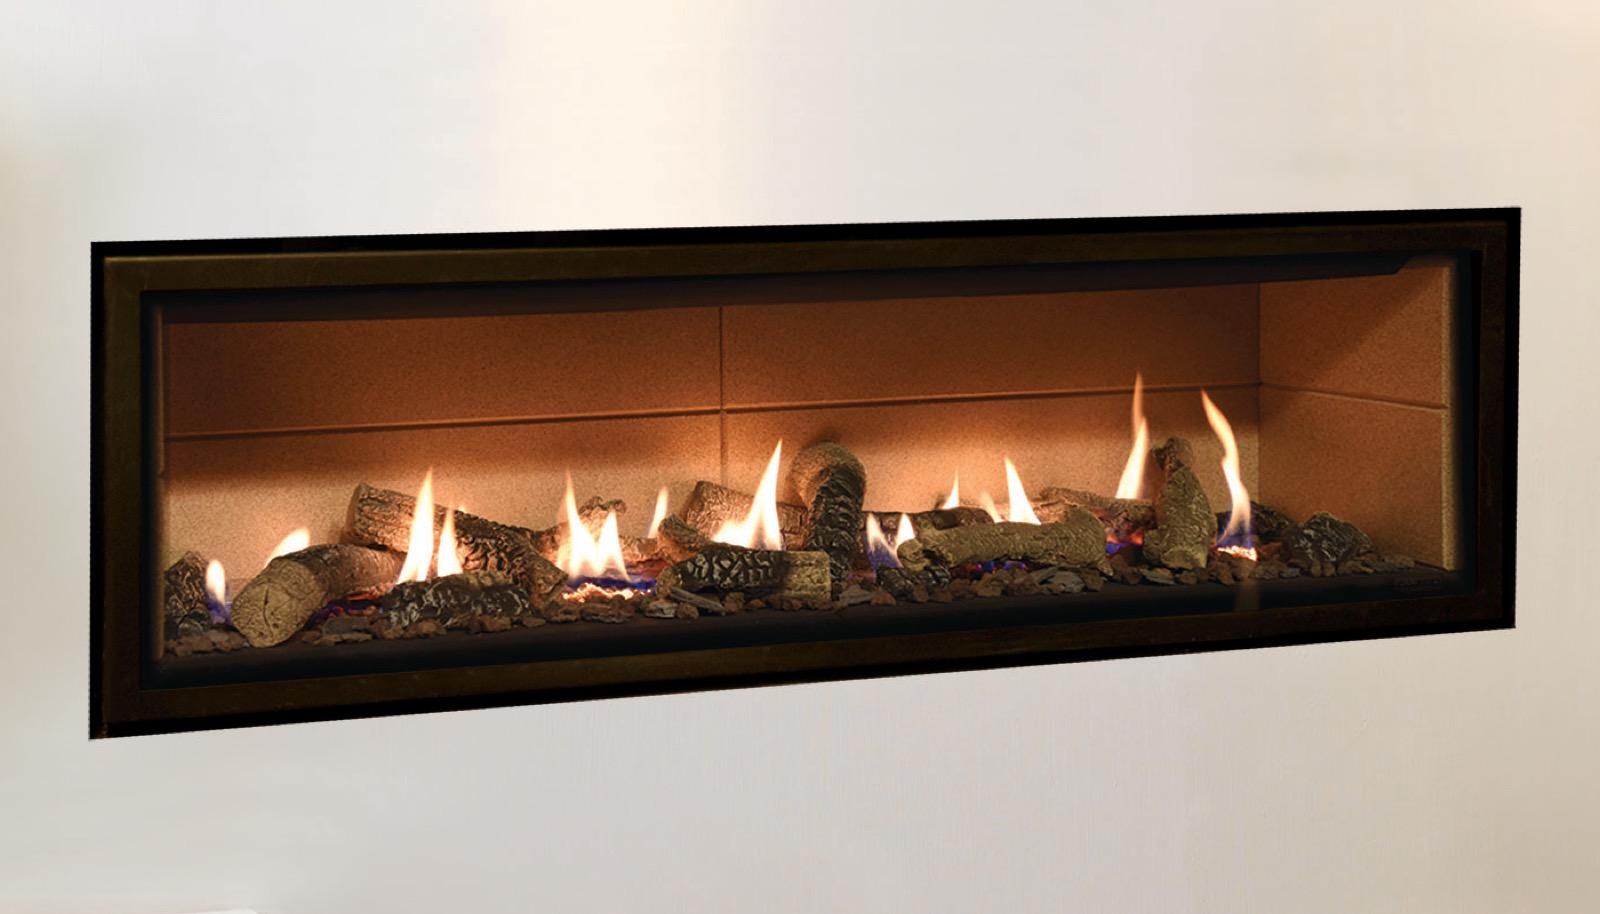 Gazco Studio 3 Edge Open Fronted Gas Fire With White